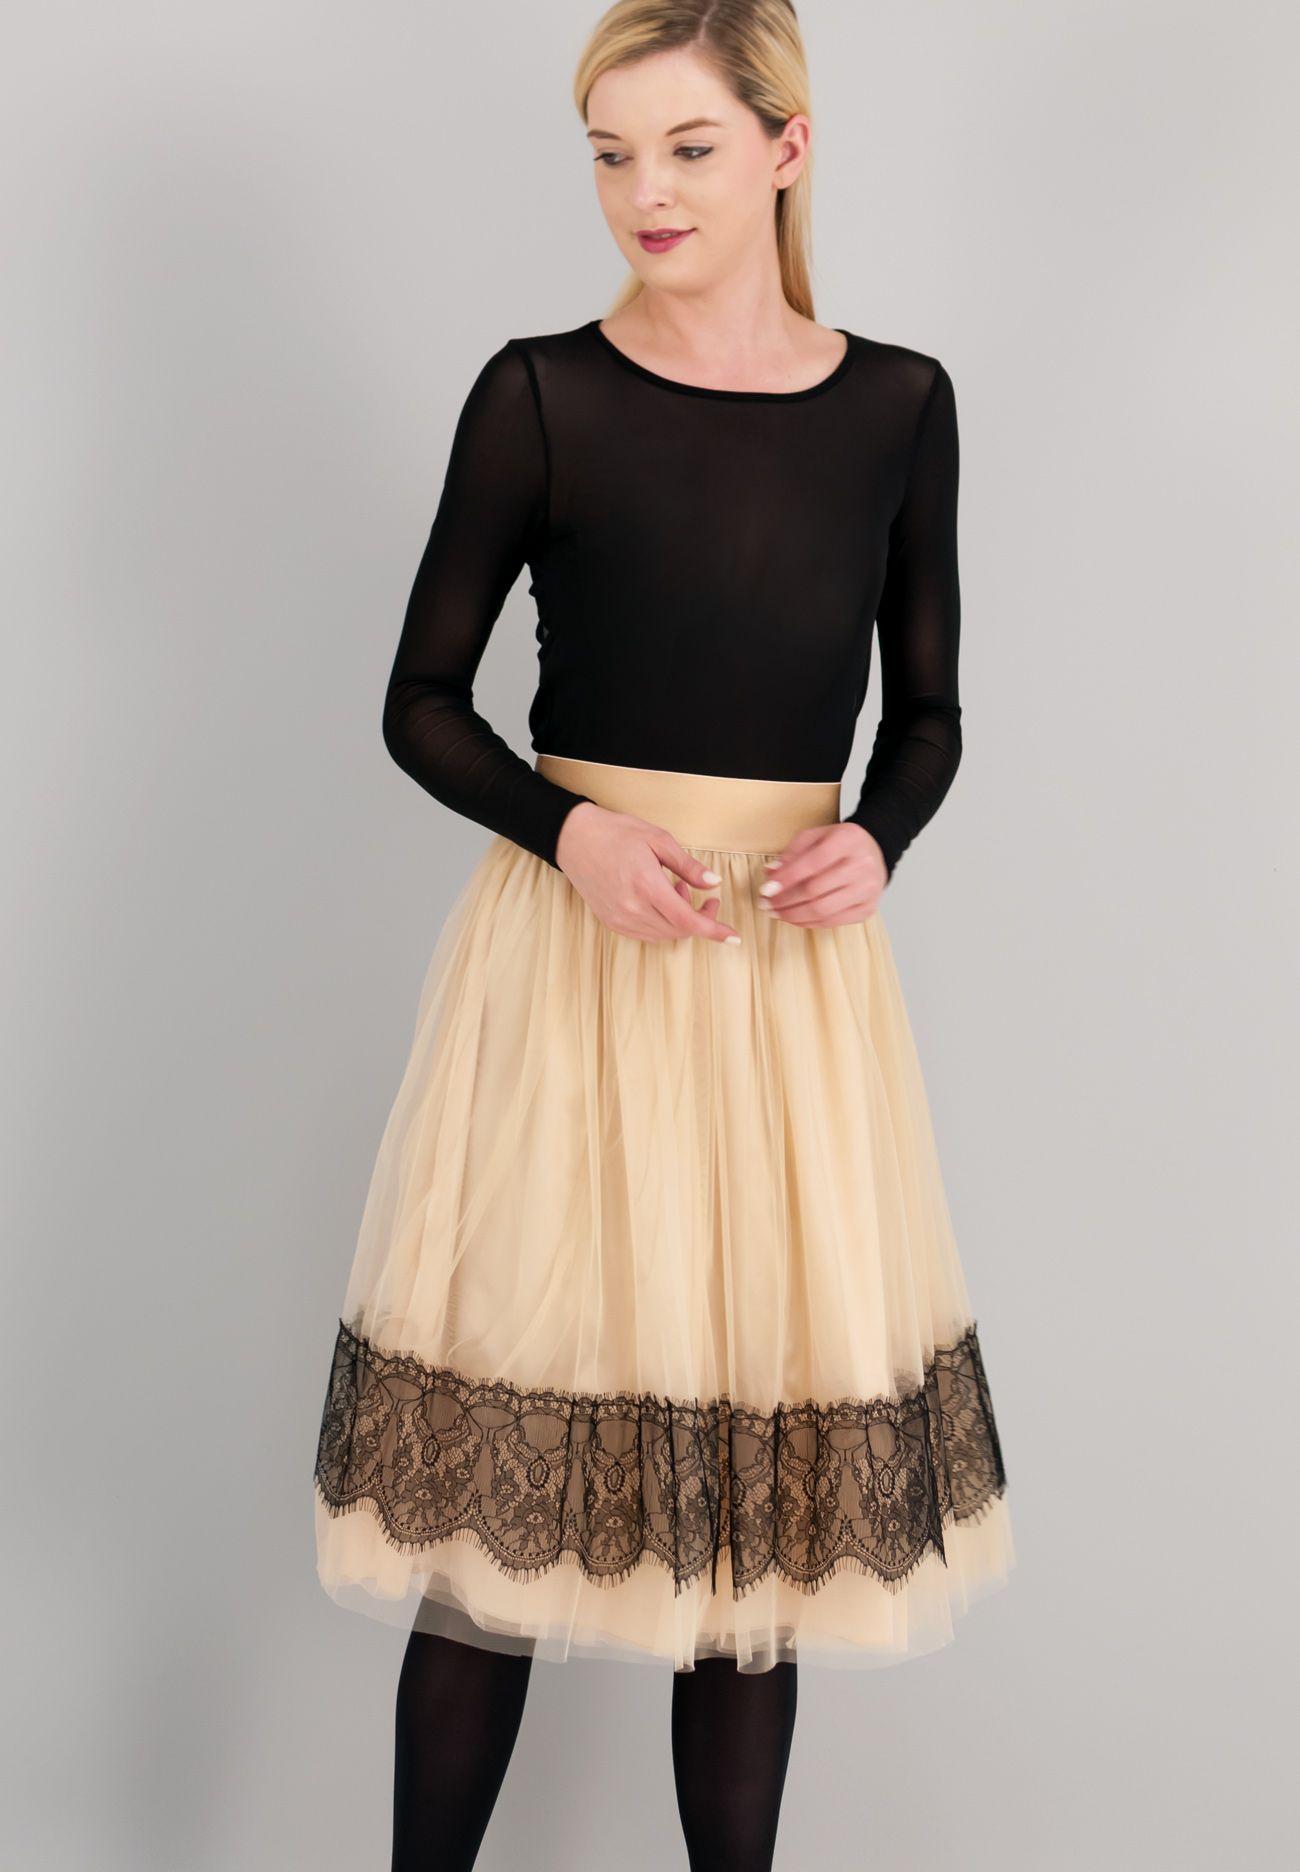 3ed4d138fdb Μίντι φούστα σε στυλ μπαλαρίνας με λεπτομέρεια από δαντέλα ...